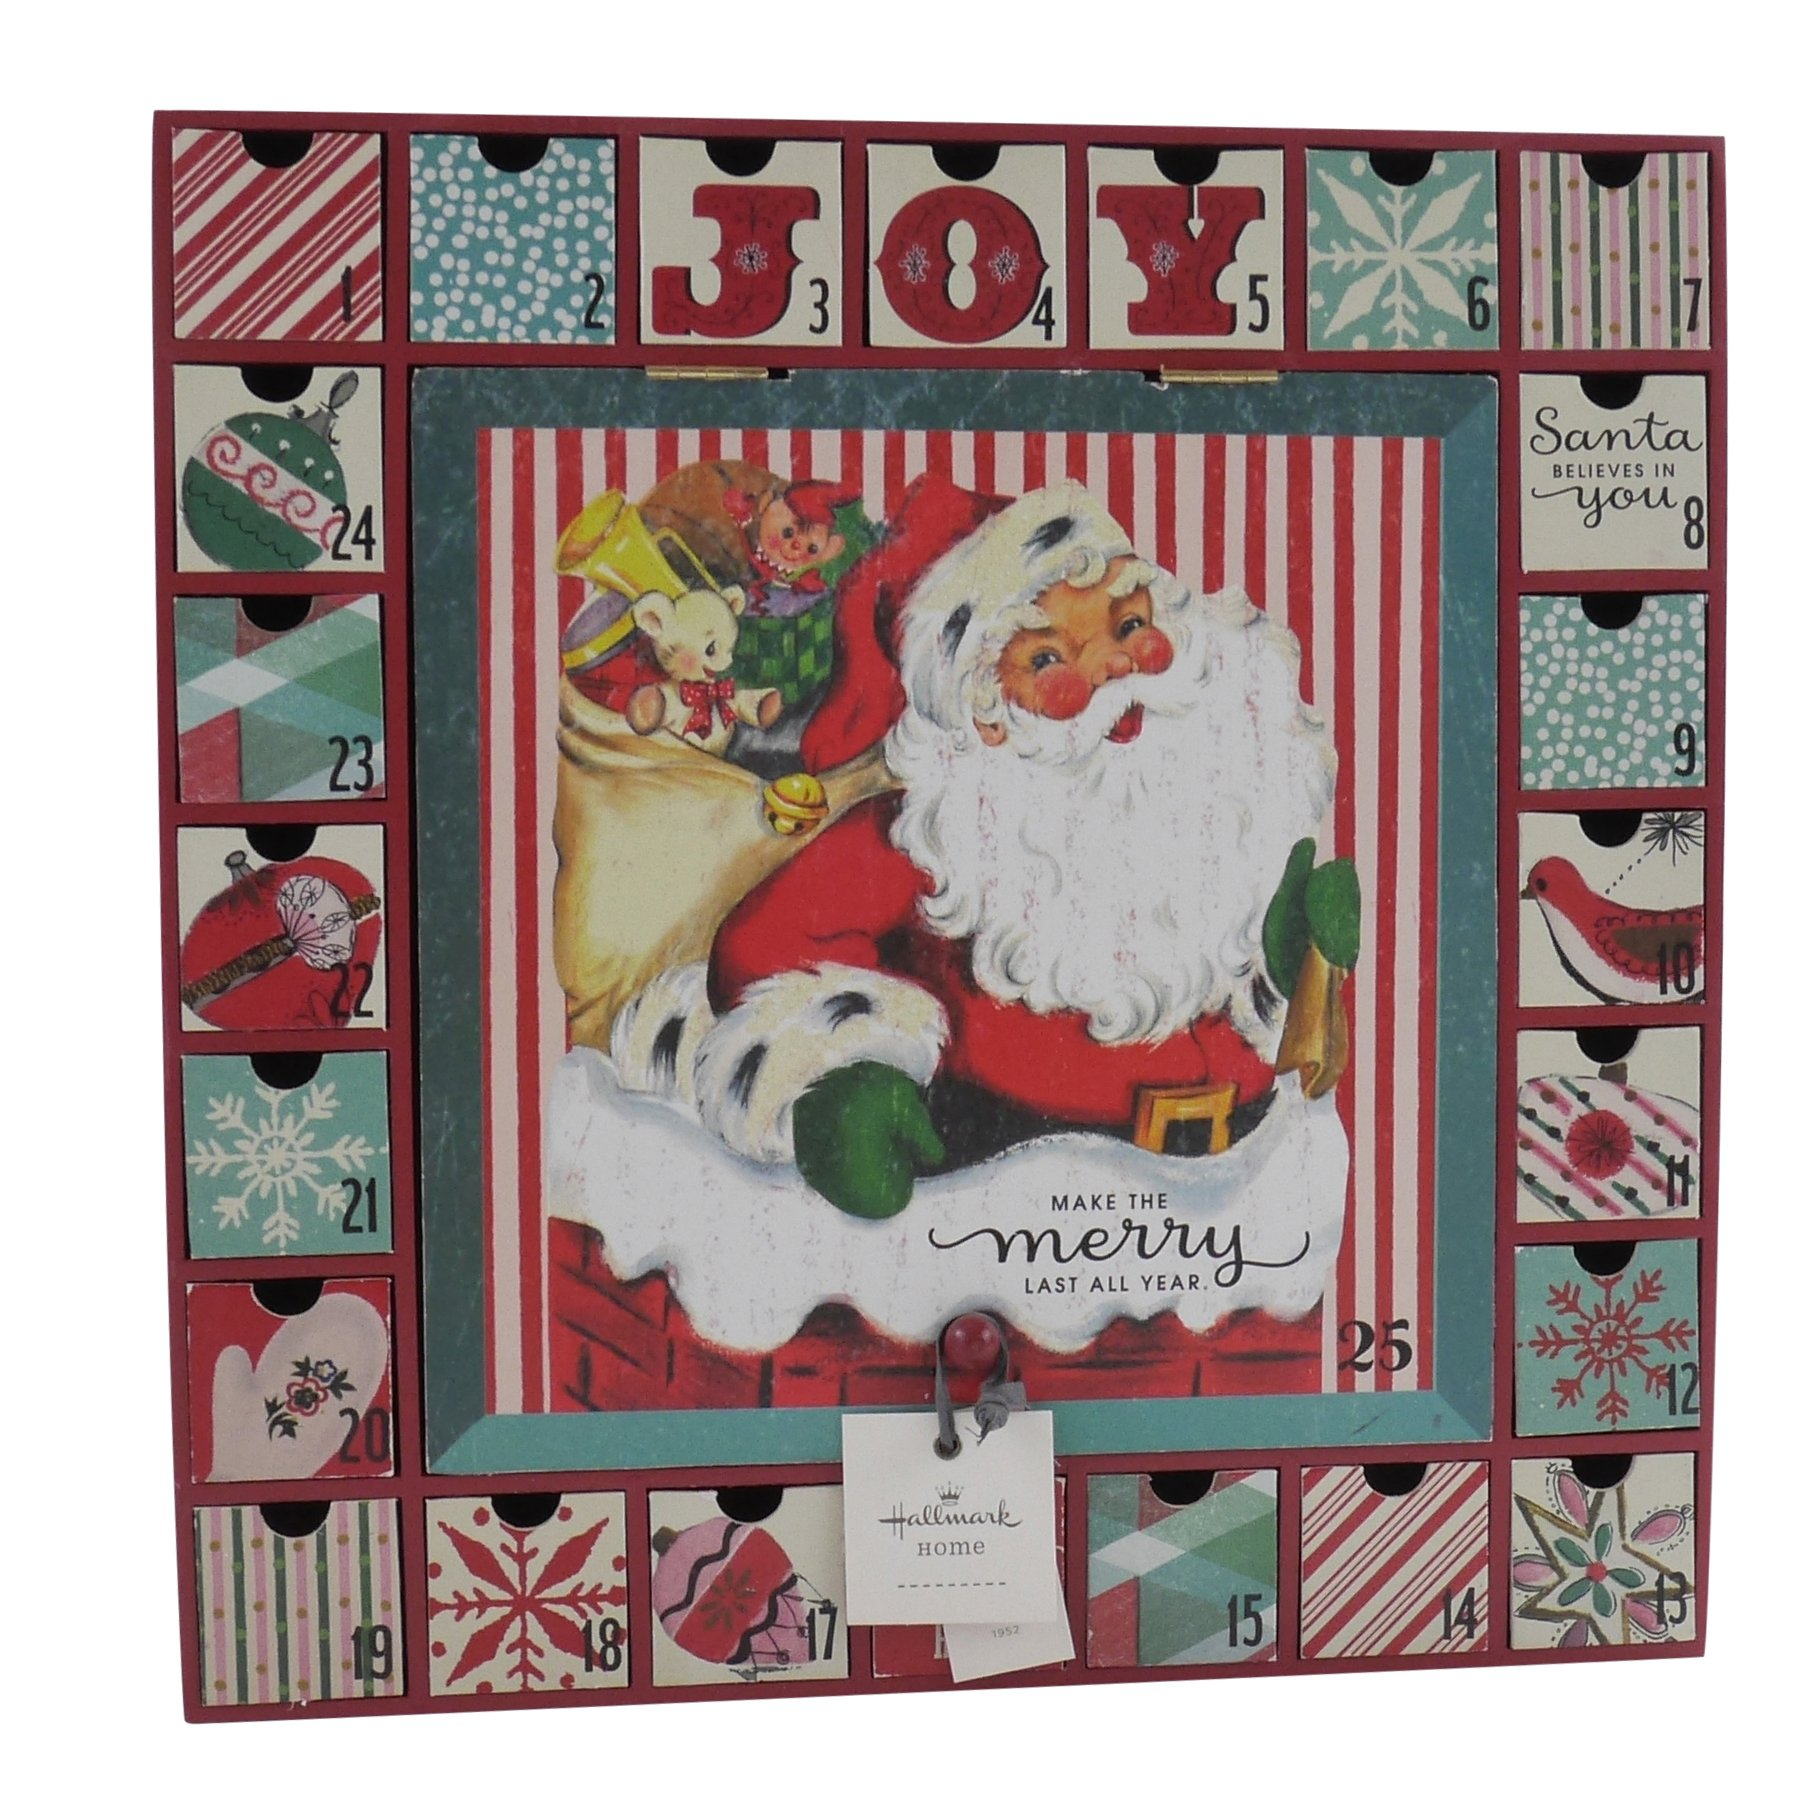 Hallmark Home Vintage Inspired 1950s Santa Wood Drawer Advent Calendar by Hallmark Home (Image #1)